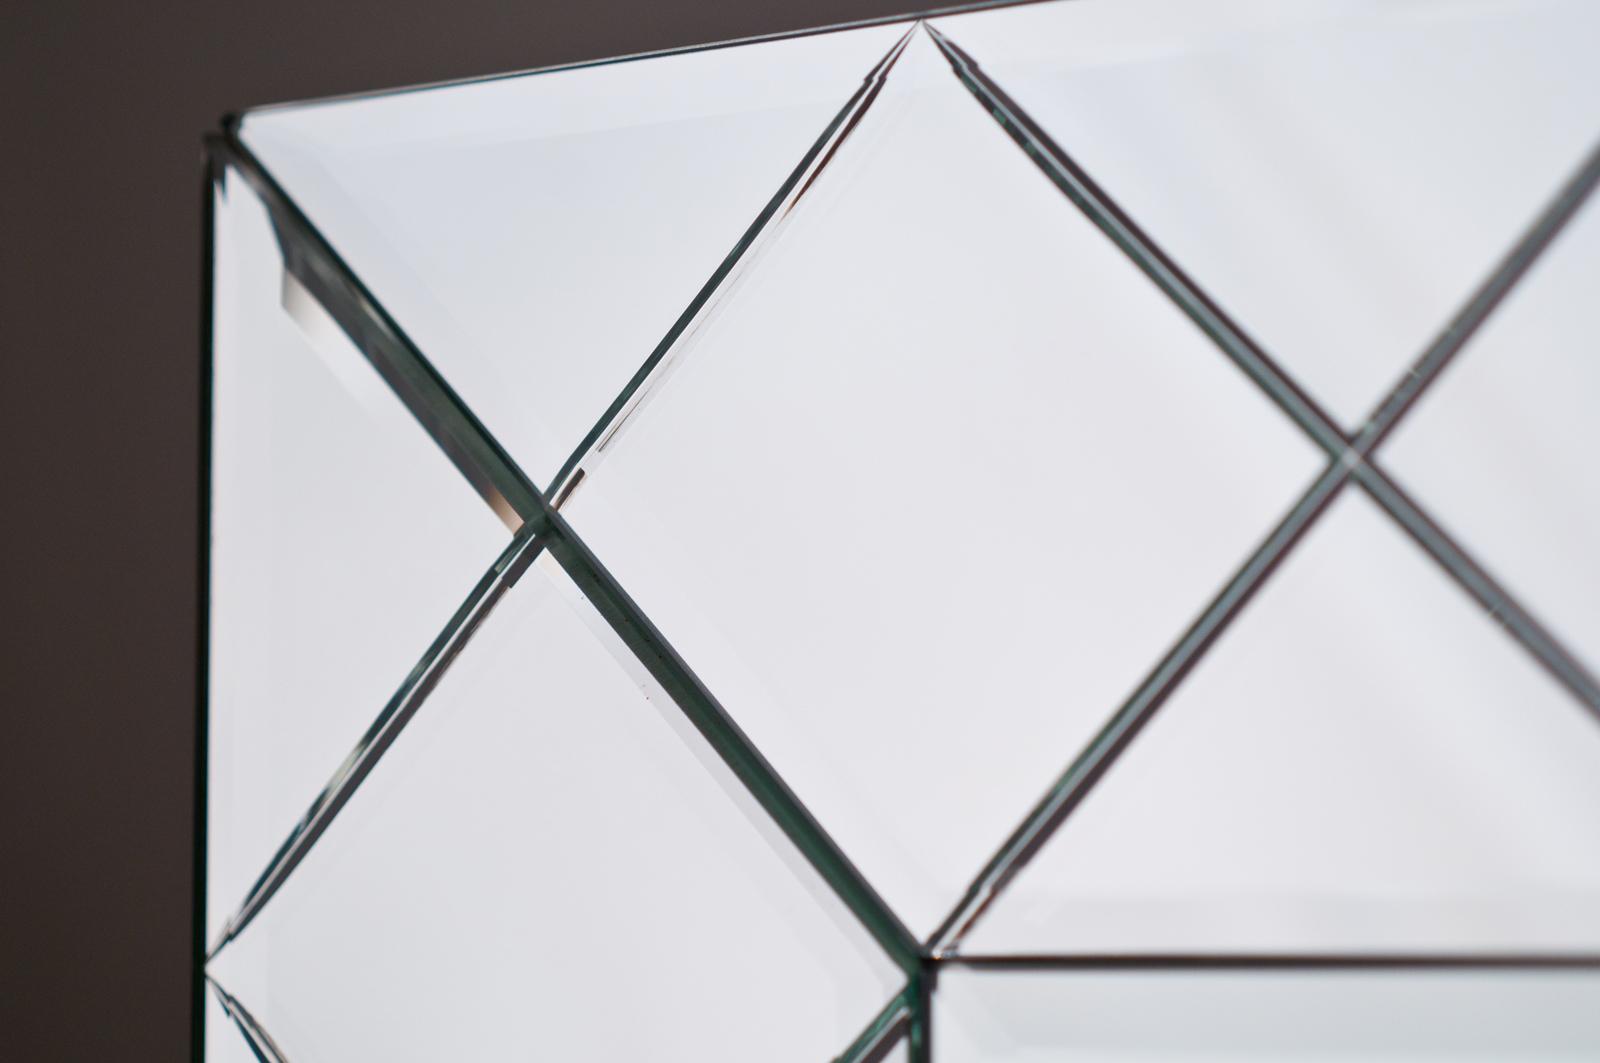 Illusion-miroir-mirror-veronese-5.jpg